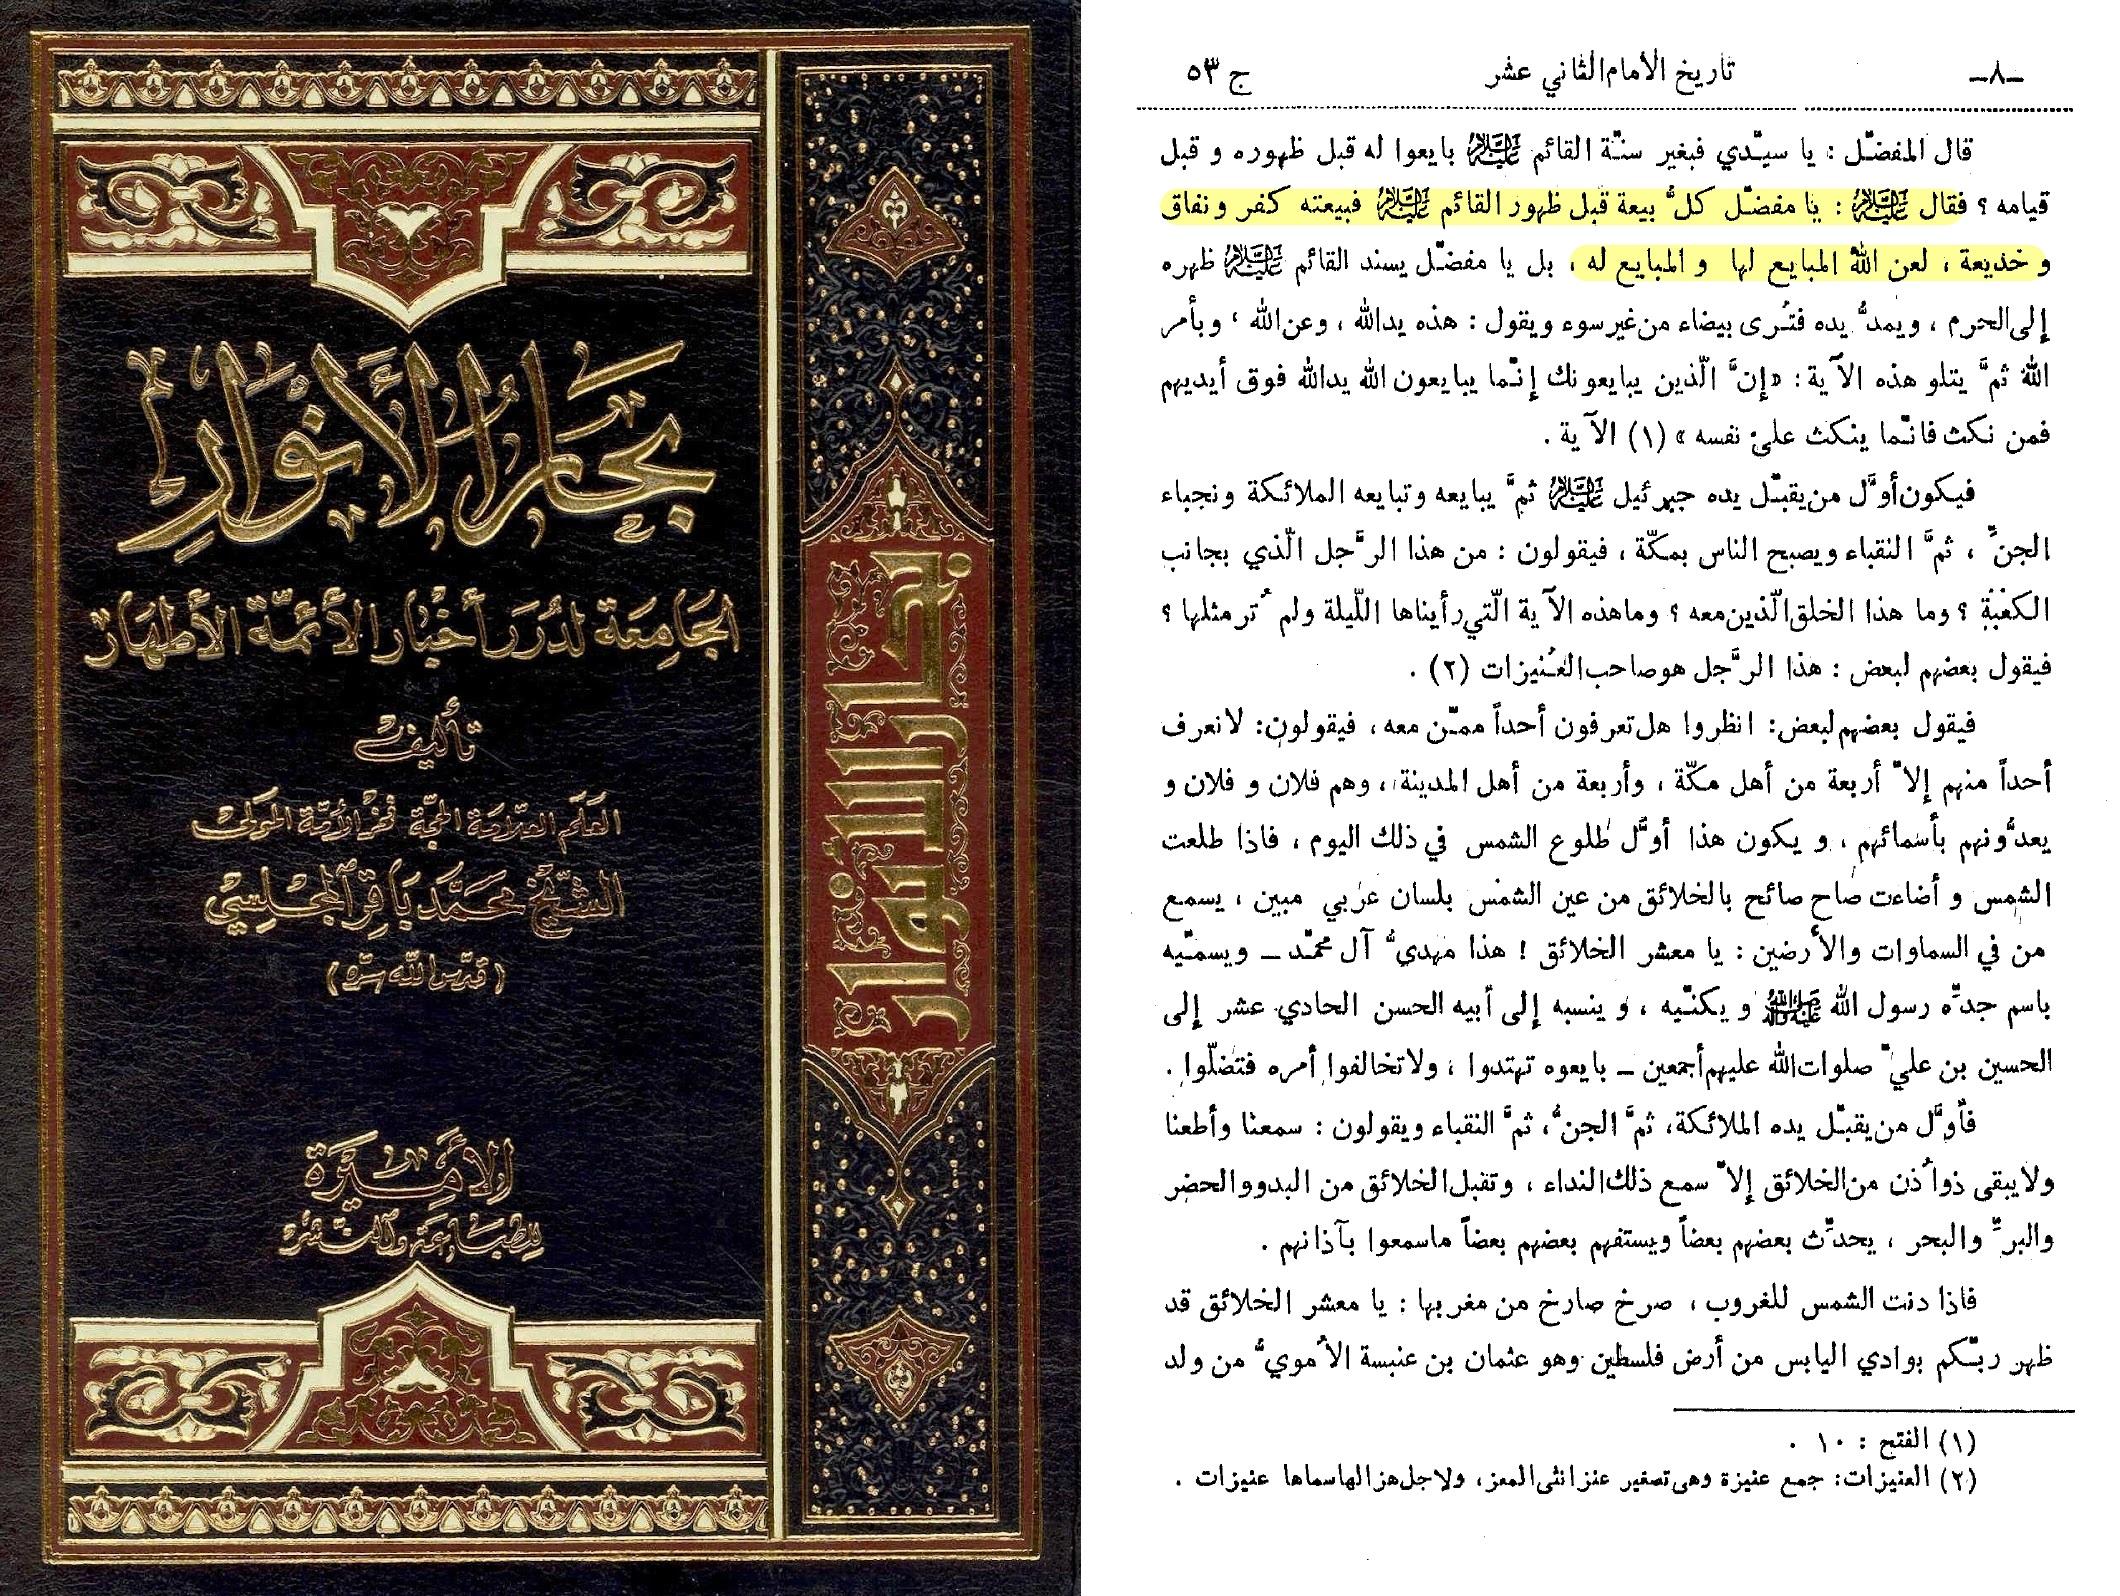 be7ar-anwar-band-53-seite-8-hadith-1